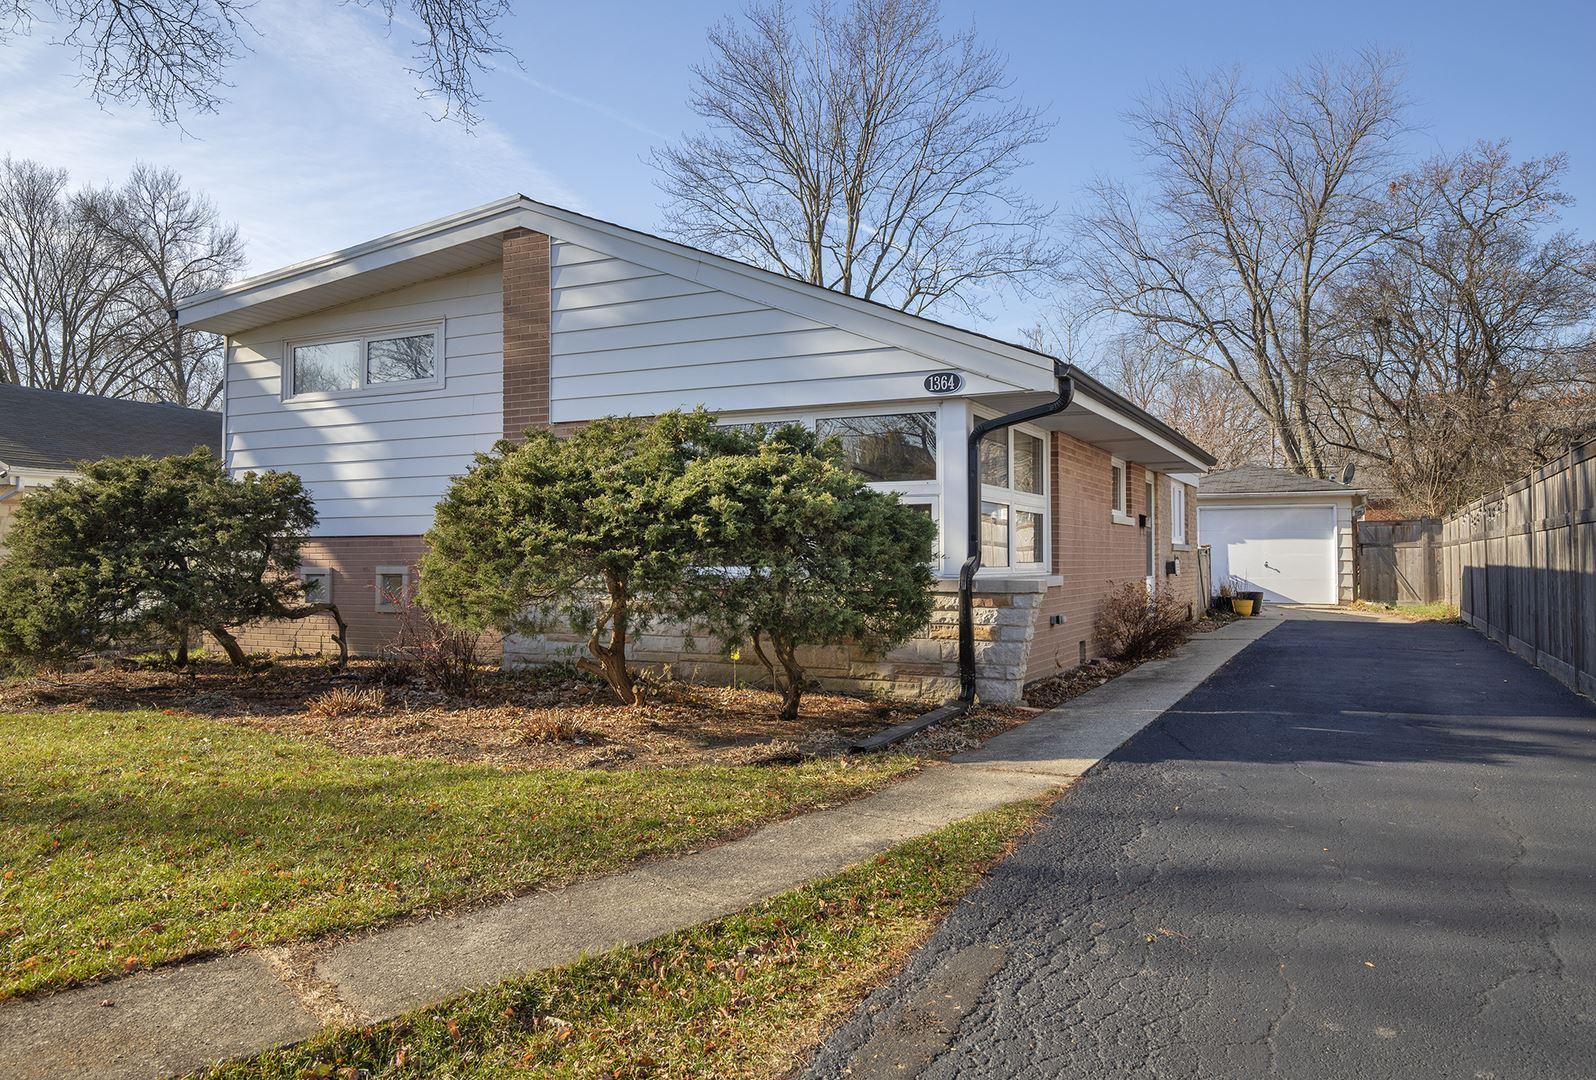 1364 Ferndale Avenue, Highland Park, IL 60035 - #: 10951564